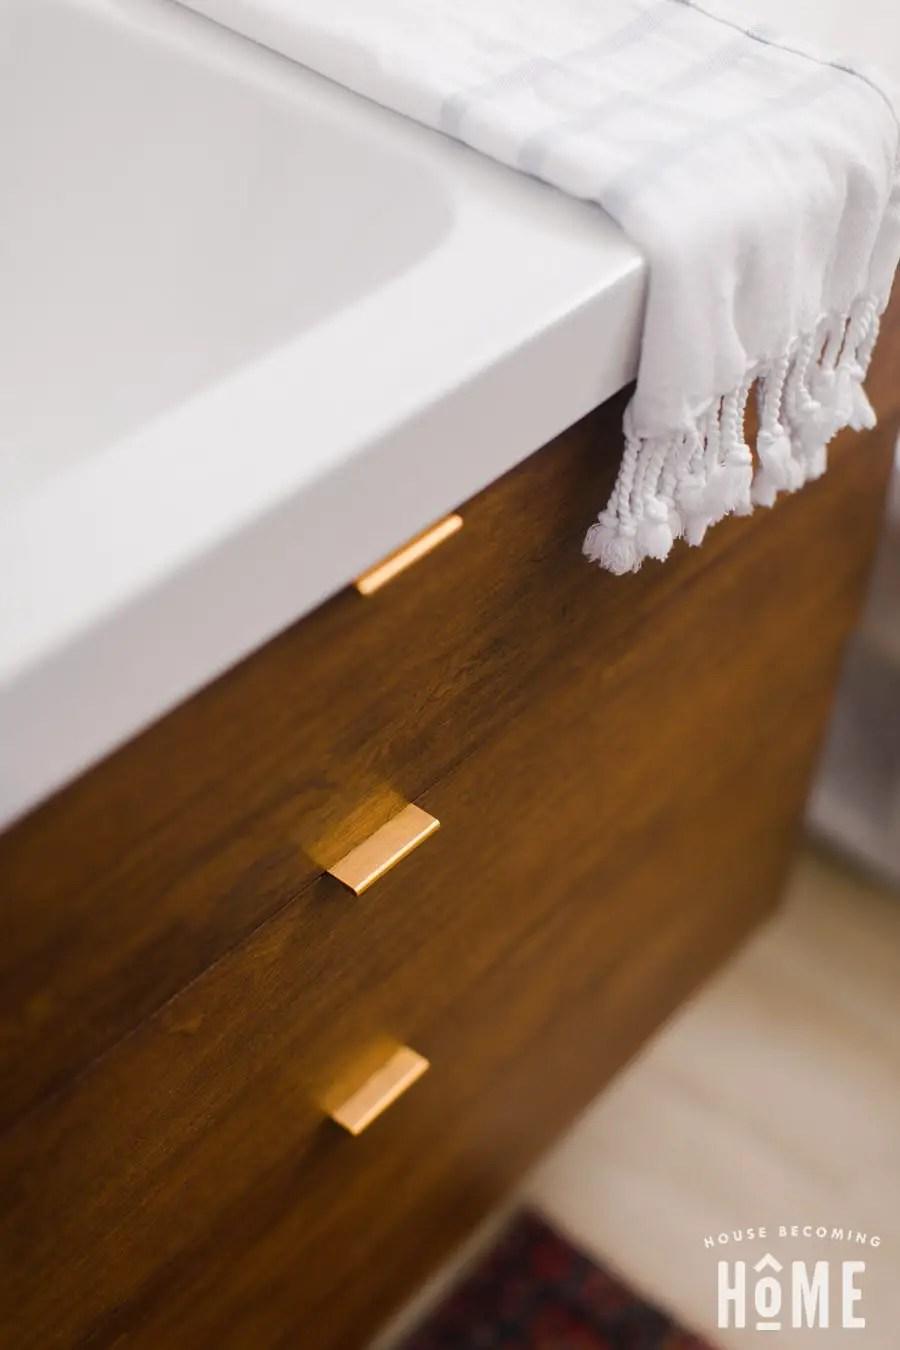 DIY vanity Plans for Ikea Odensvik Sink Drawers